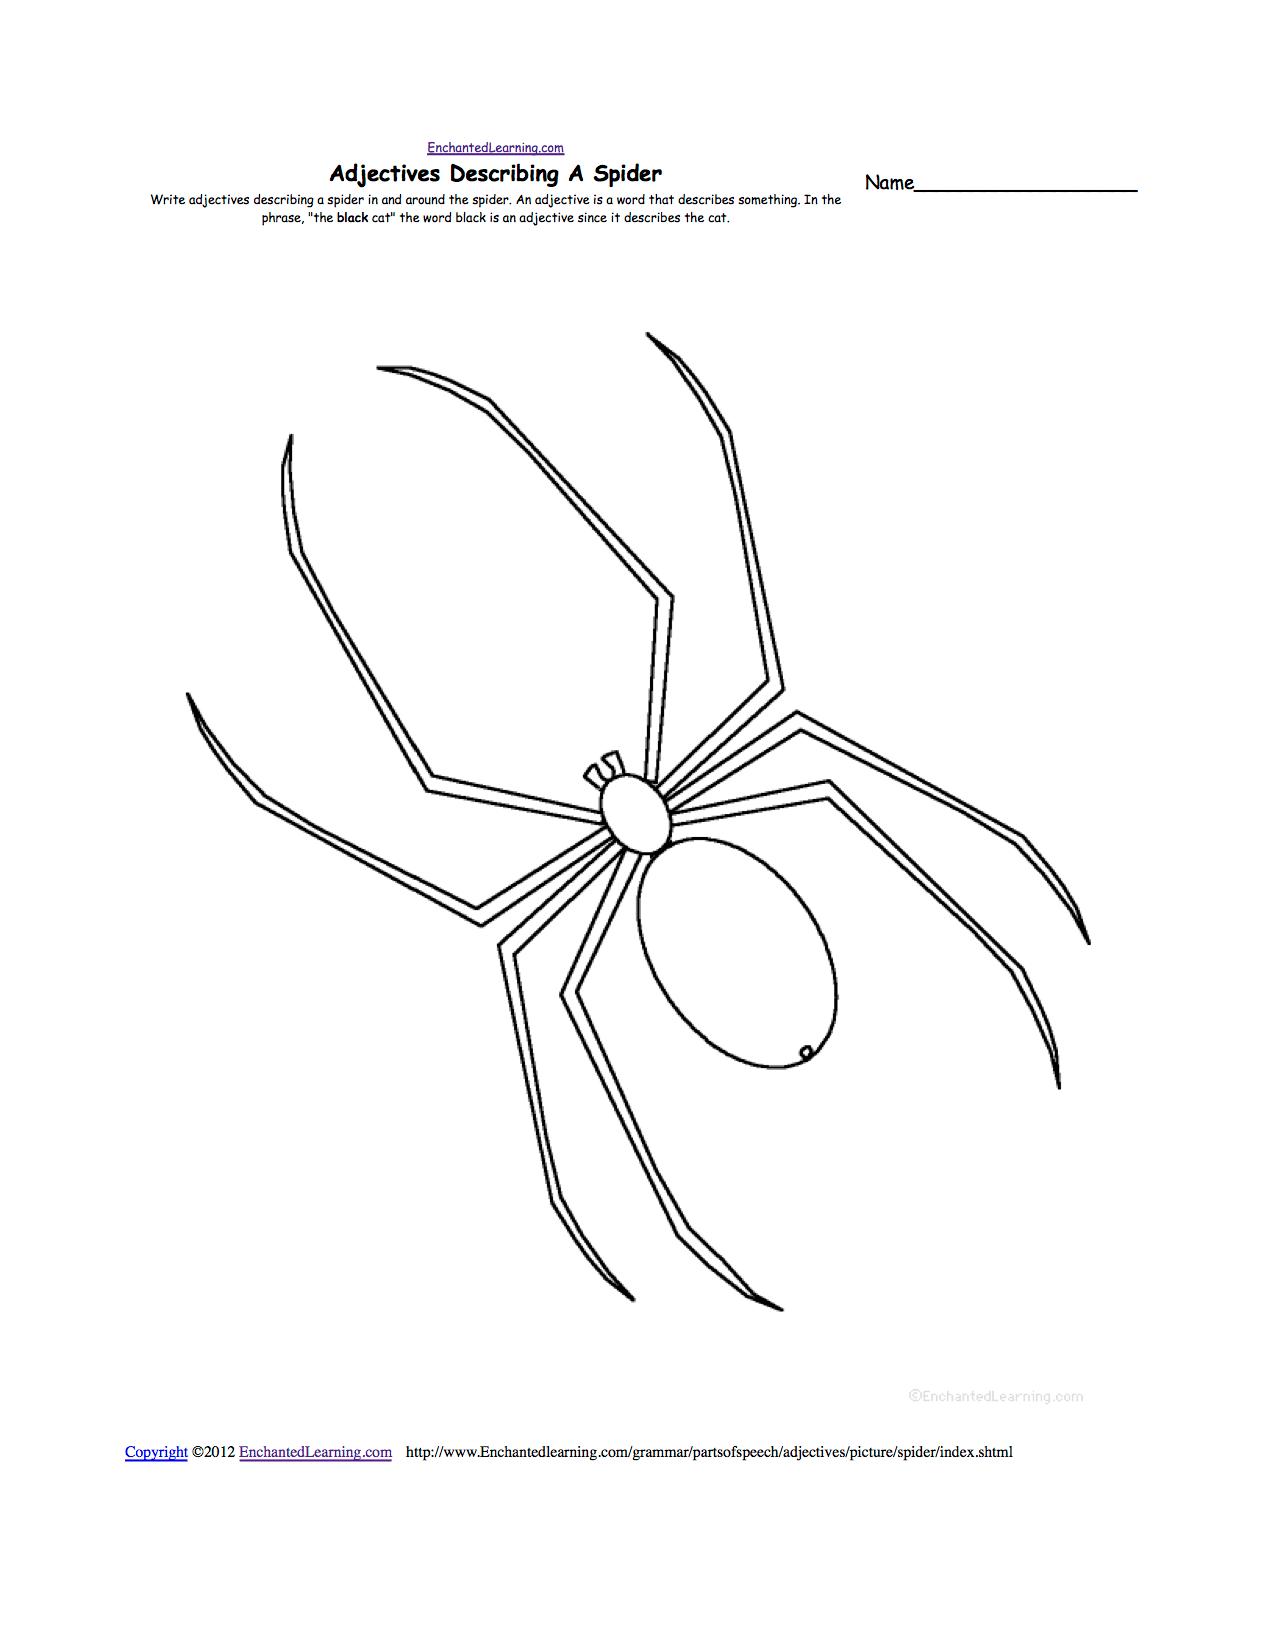 Spiders At Enchantedlearning